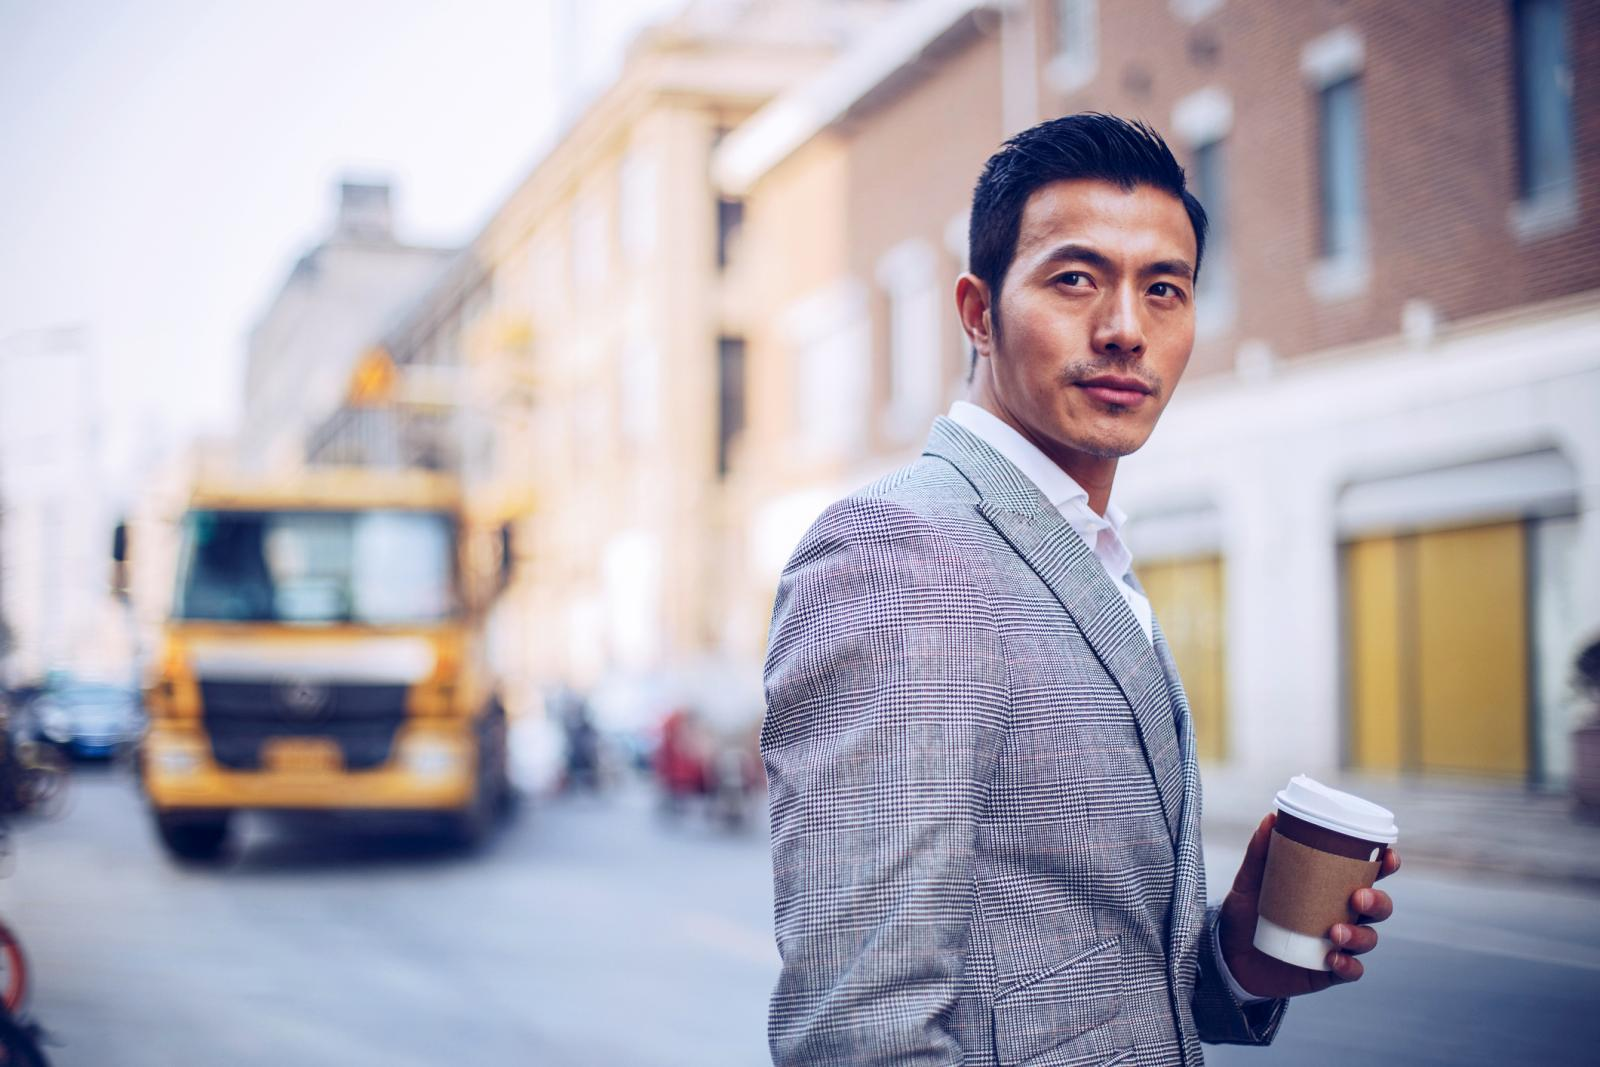 Gentleman on the street